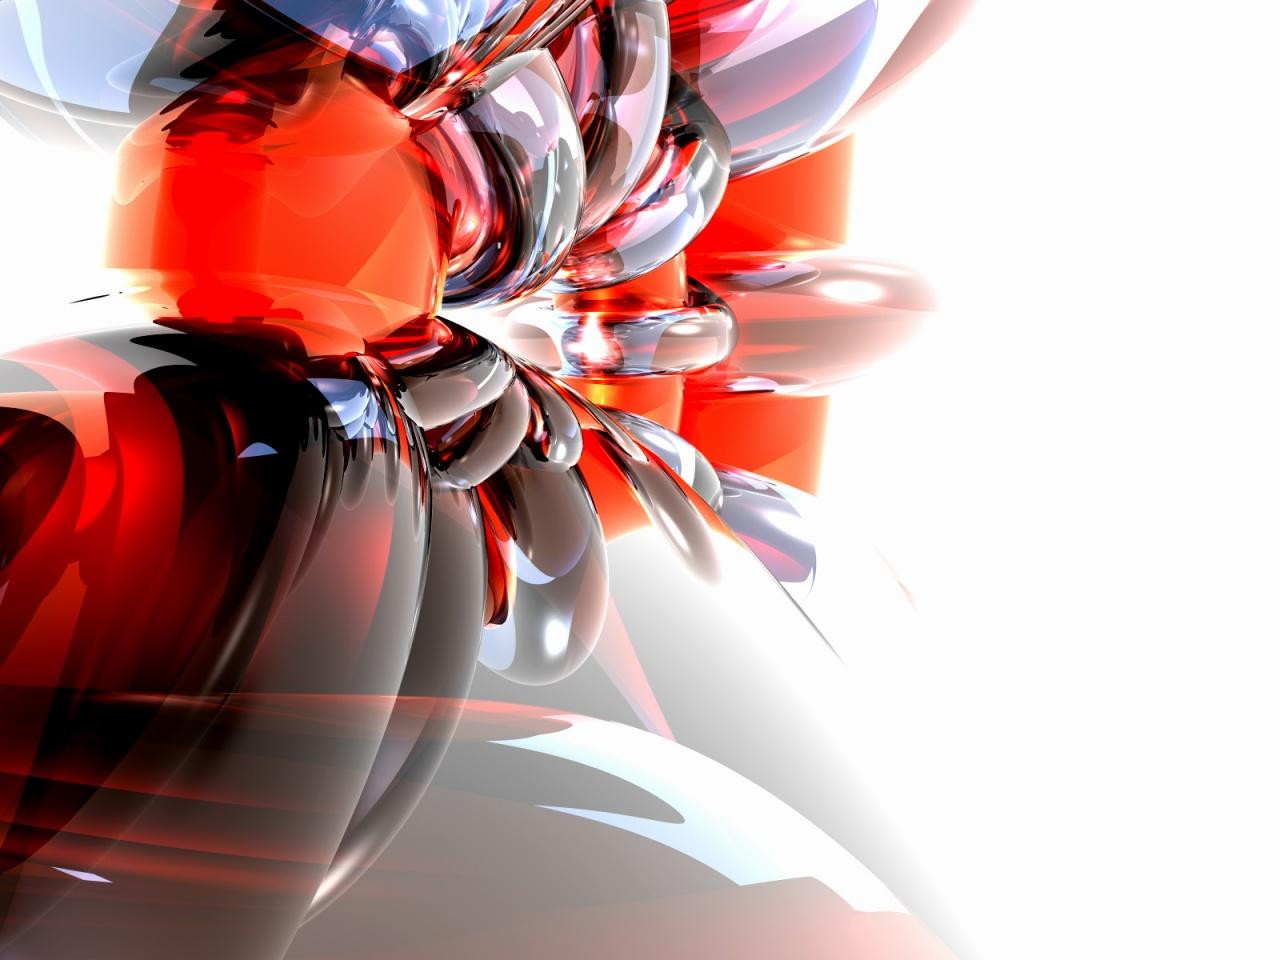 http://4.bp.blogspot.com/-o_ITtU22Eu4/UEW5DY8mYJI/AAAAAAAAAgA/9zkVKuwfBFA/s1600/Beautiful+3D+Wallpaper.jpg